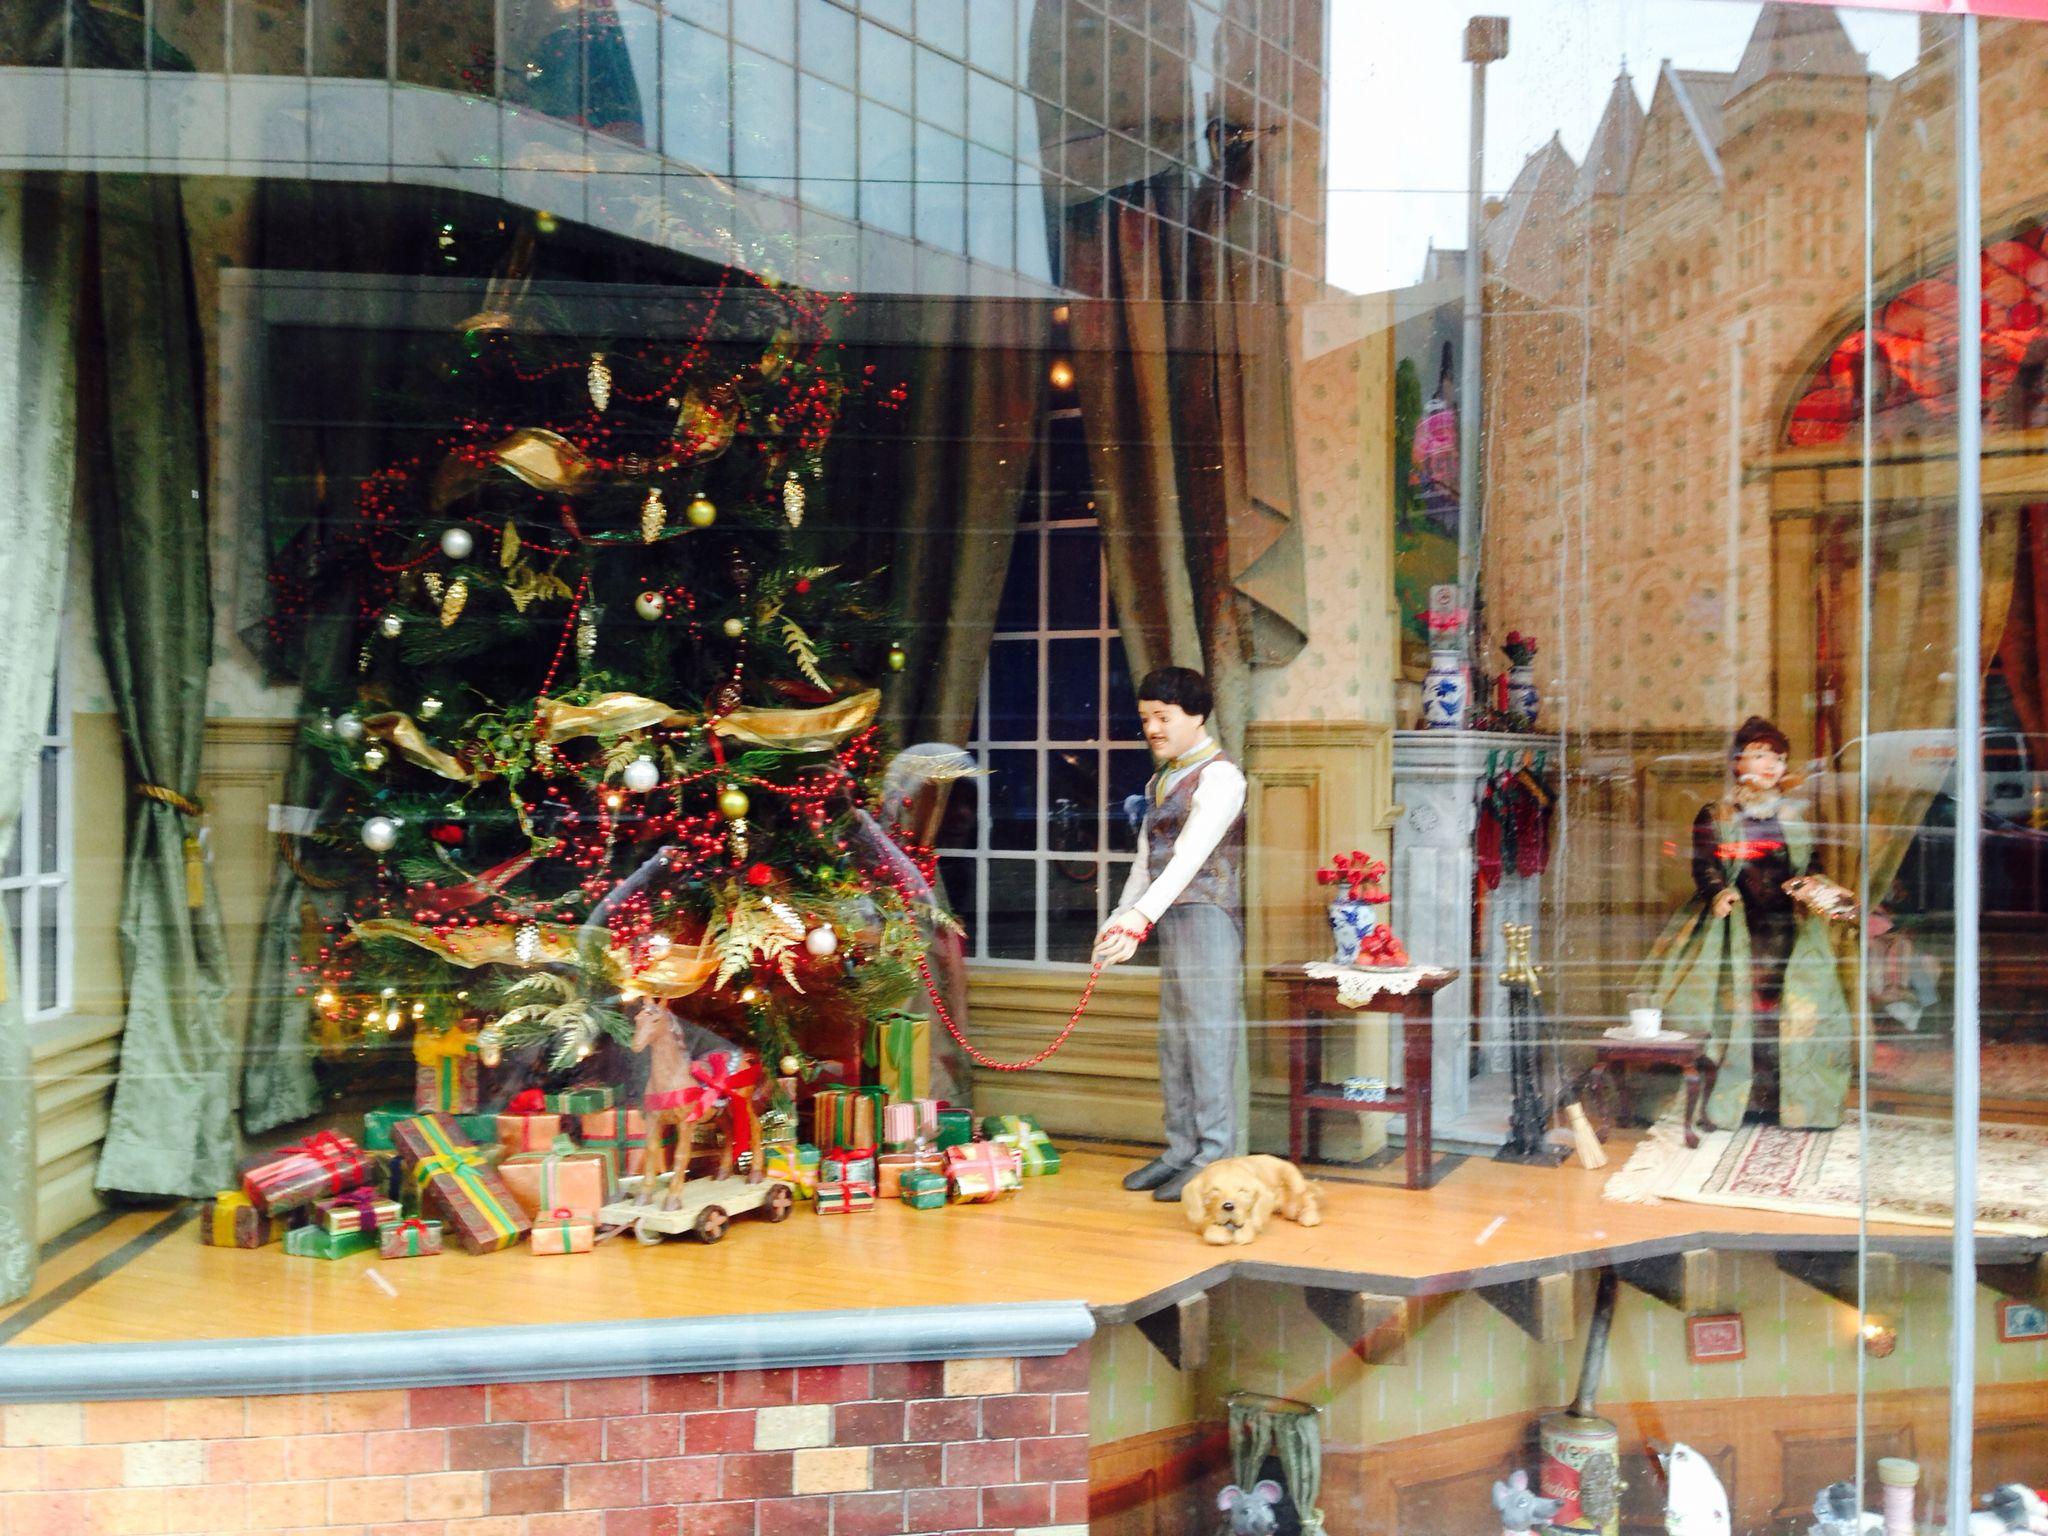 The Toronto Bay store 2014 Christmas windows.